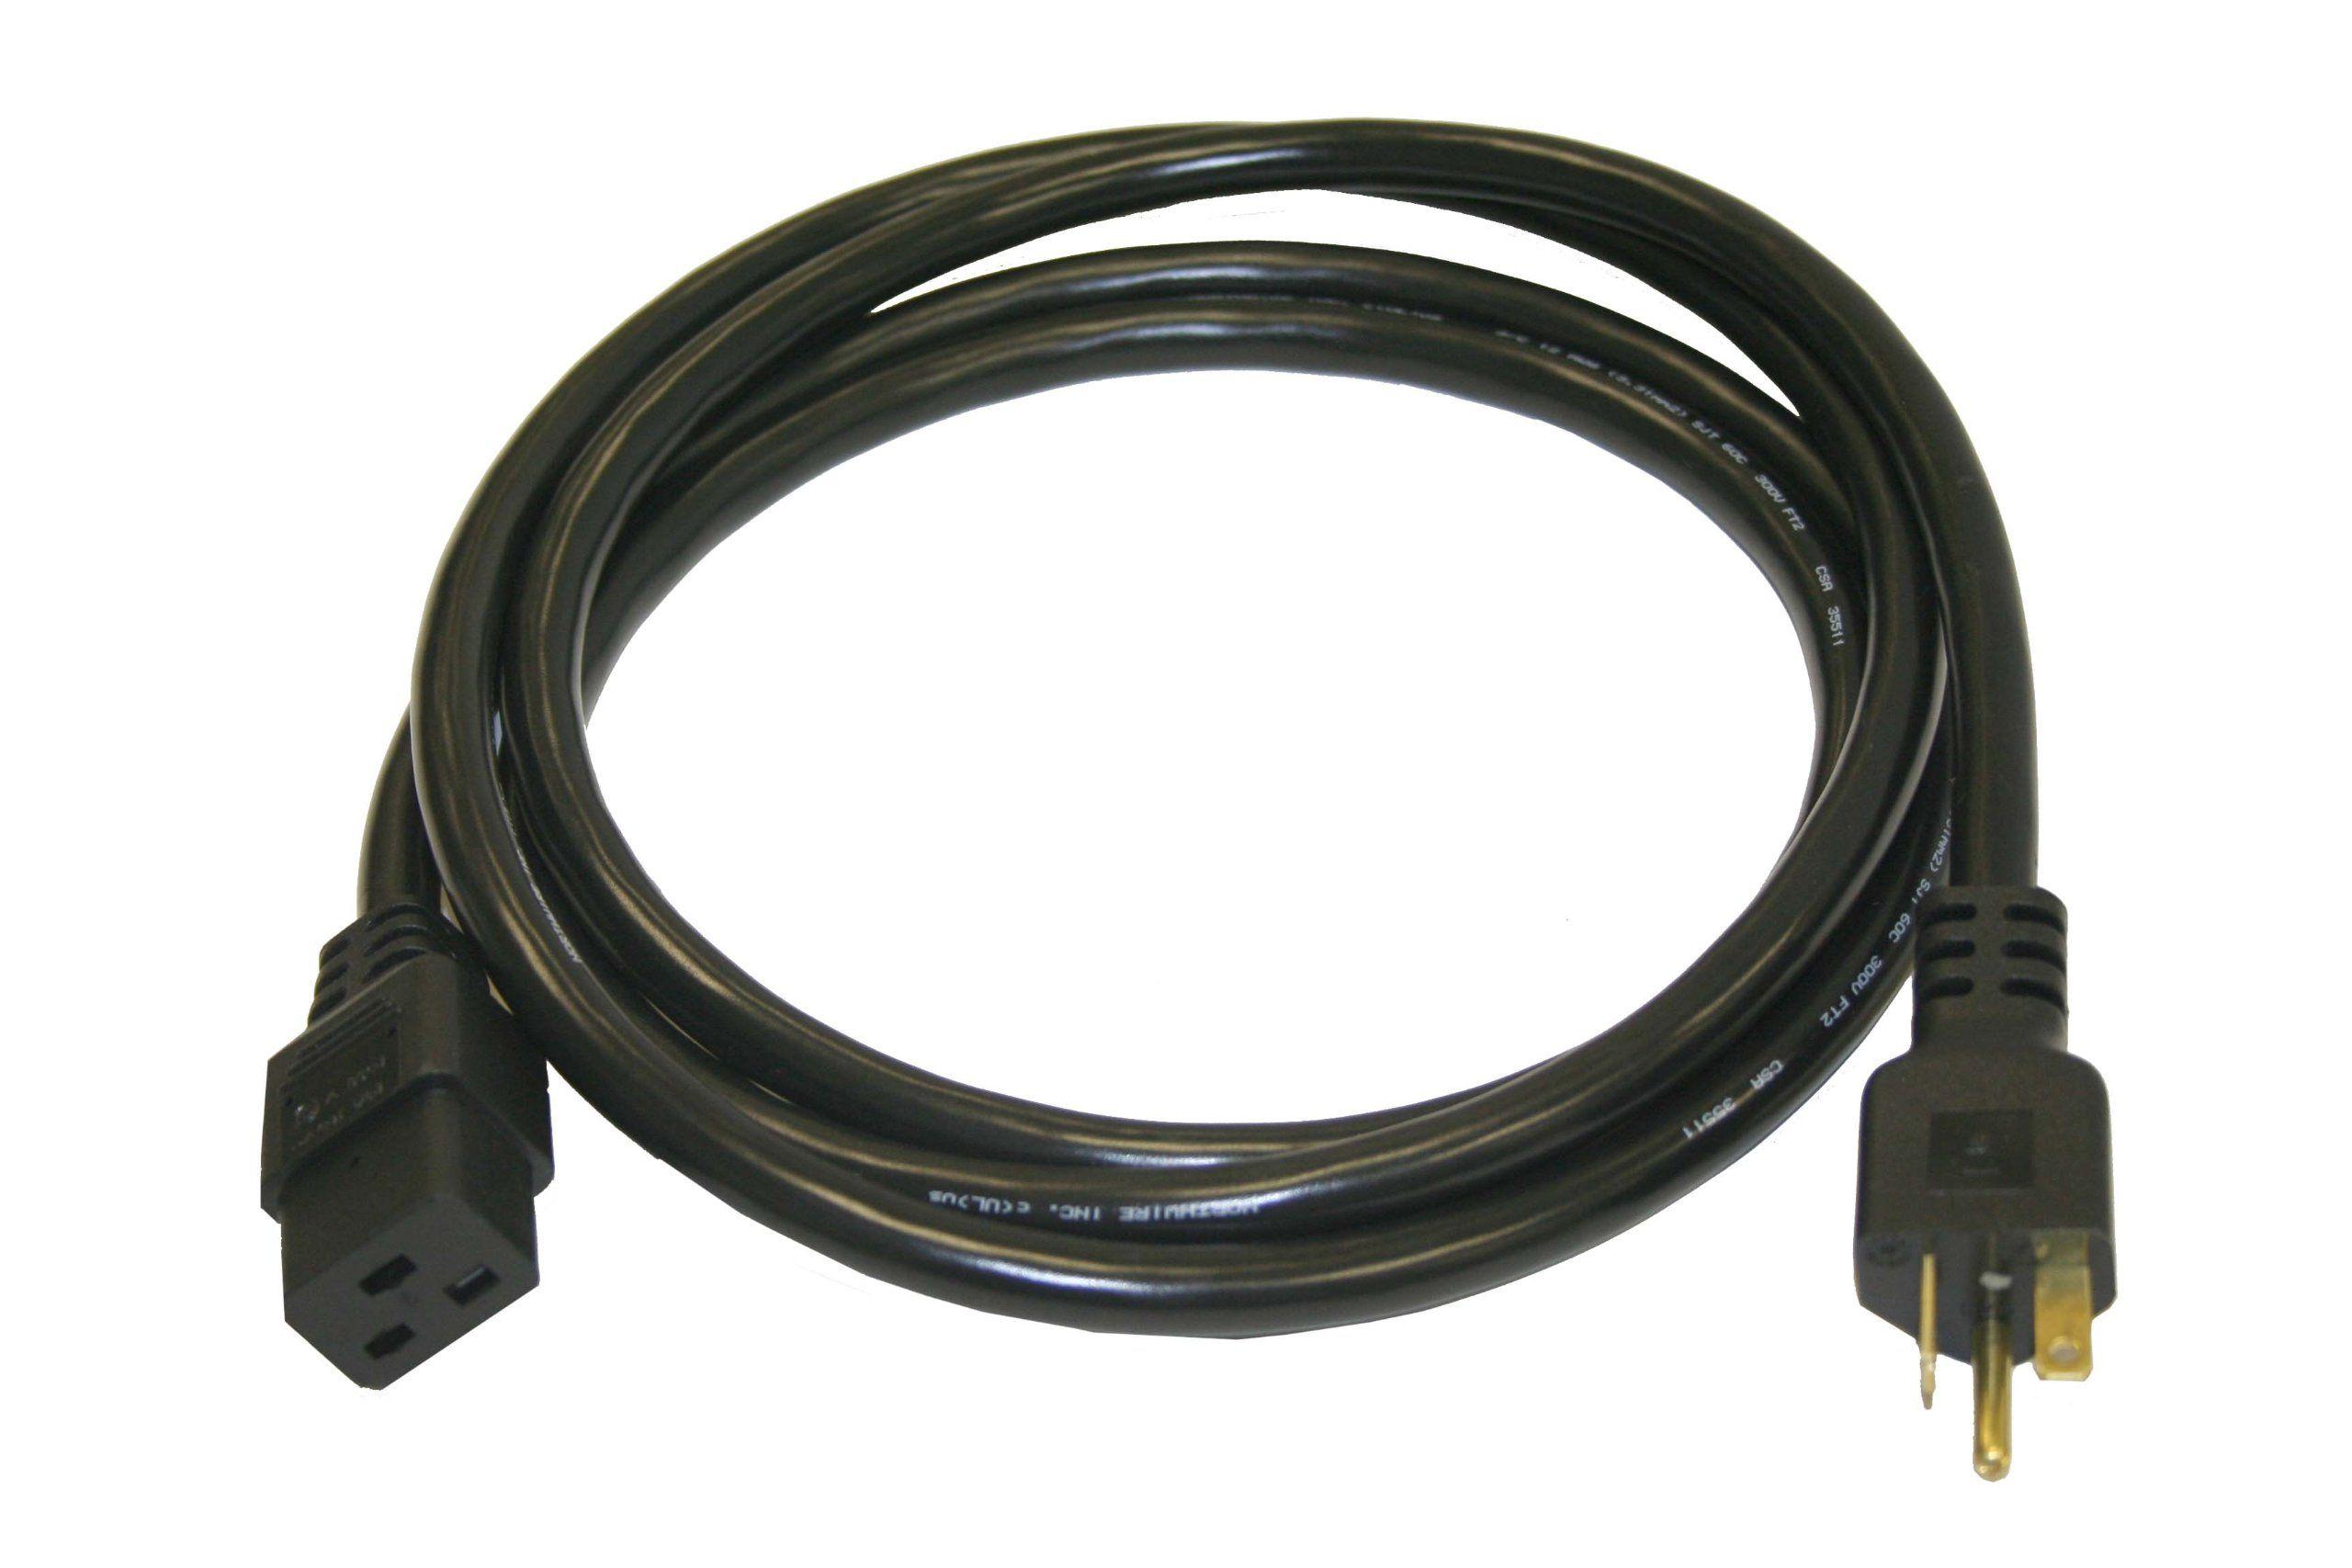 Interpower 86226020 North American NEMA 520P Cord Set NEMA